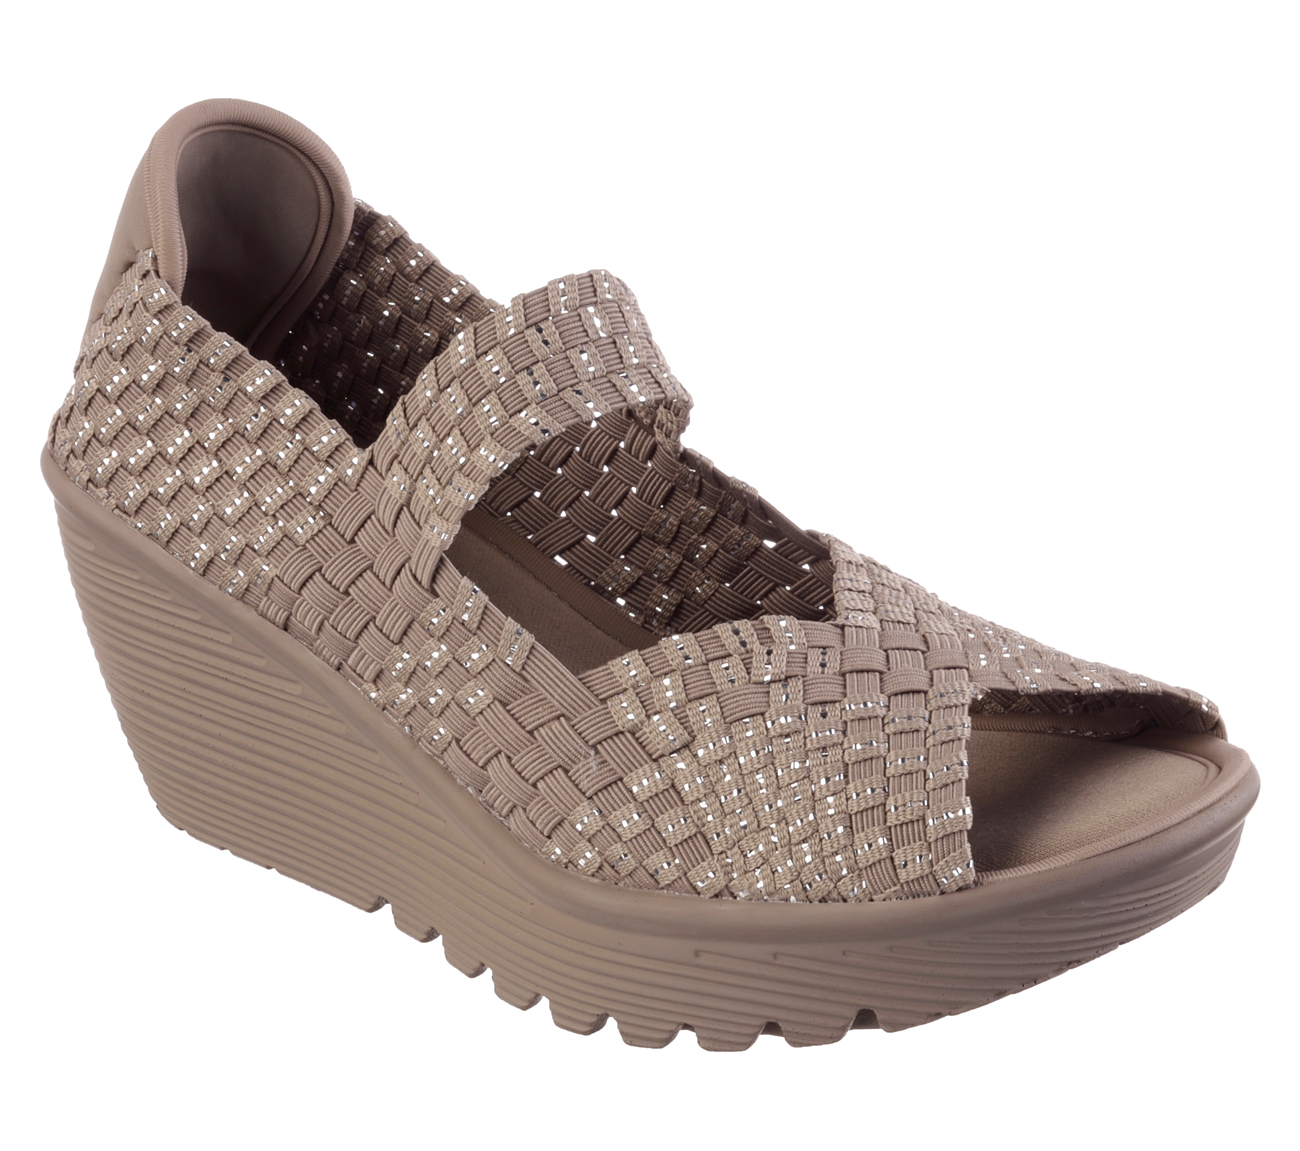 Simple Skechers Ladies Womens Go Walk MRW Sports Sandals Casual